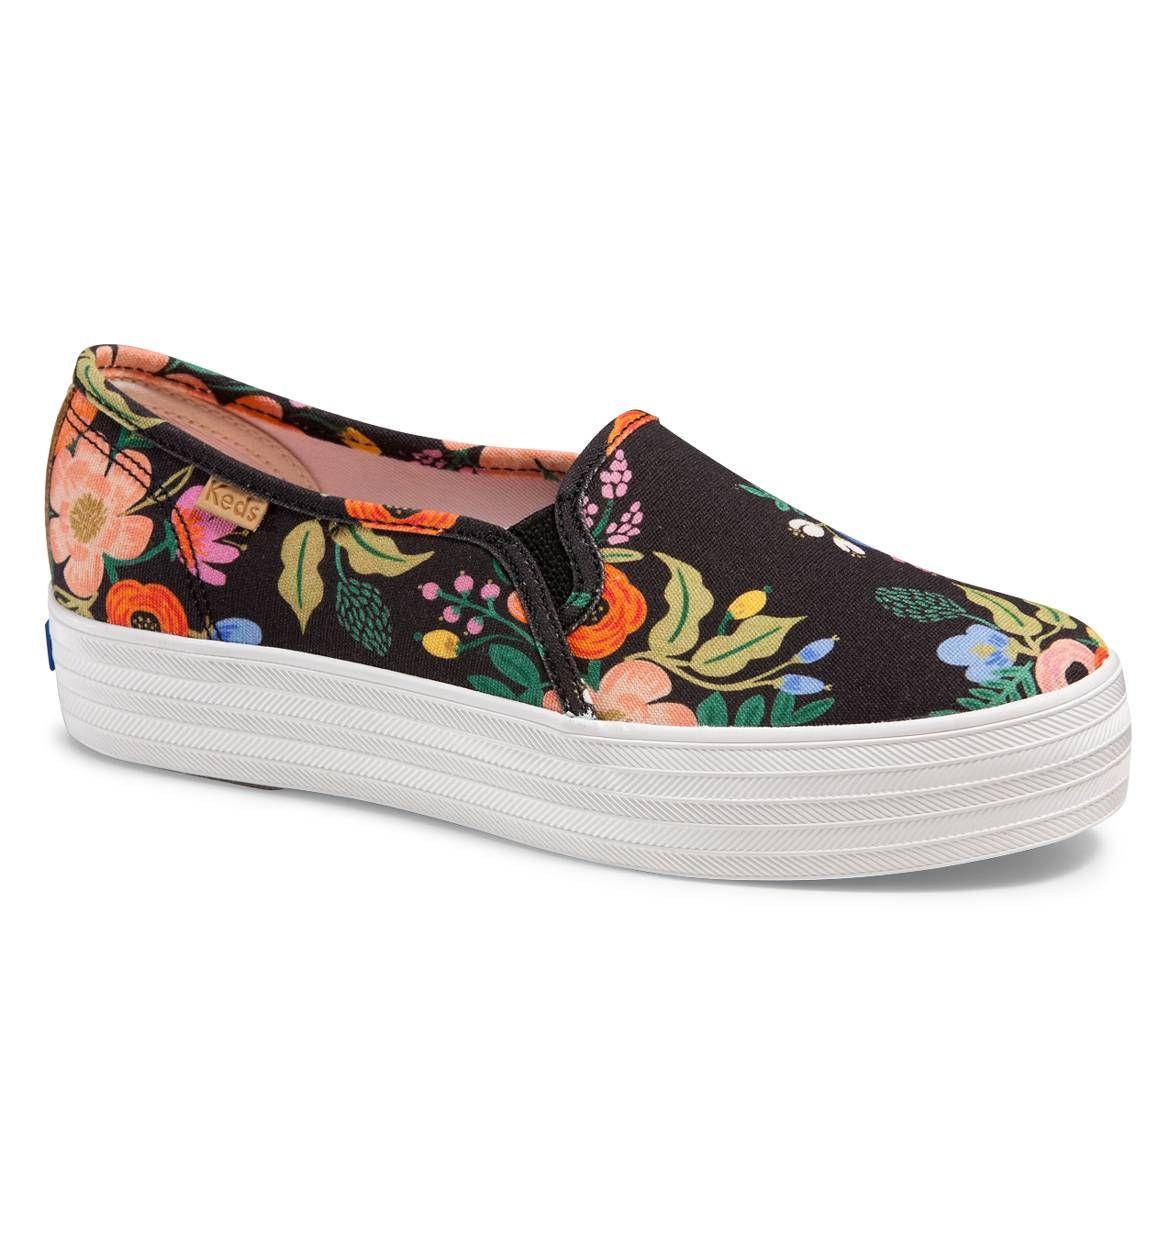 8ce5df925f RIFLE PAPER Co. Triple Decker Slip-On Platform Shoe in Lively Floral ...